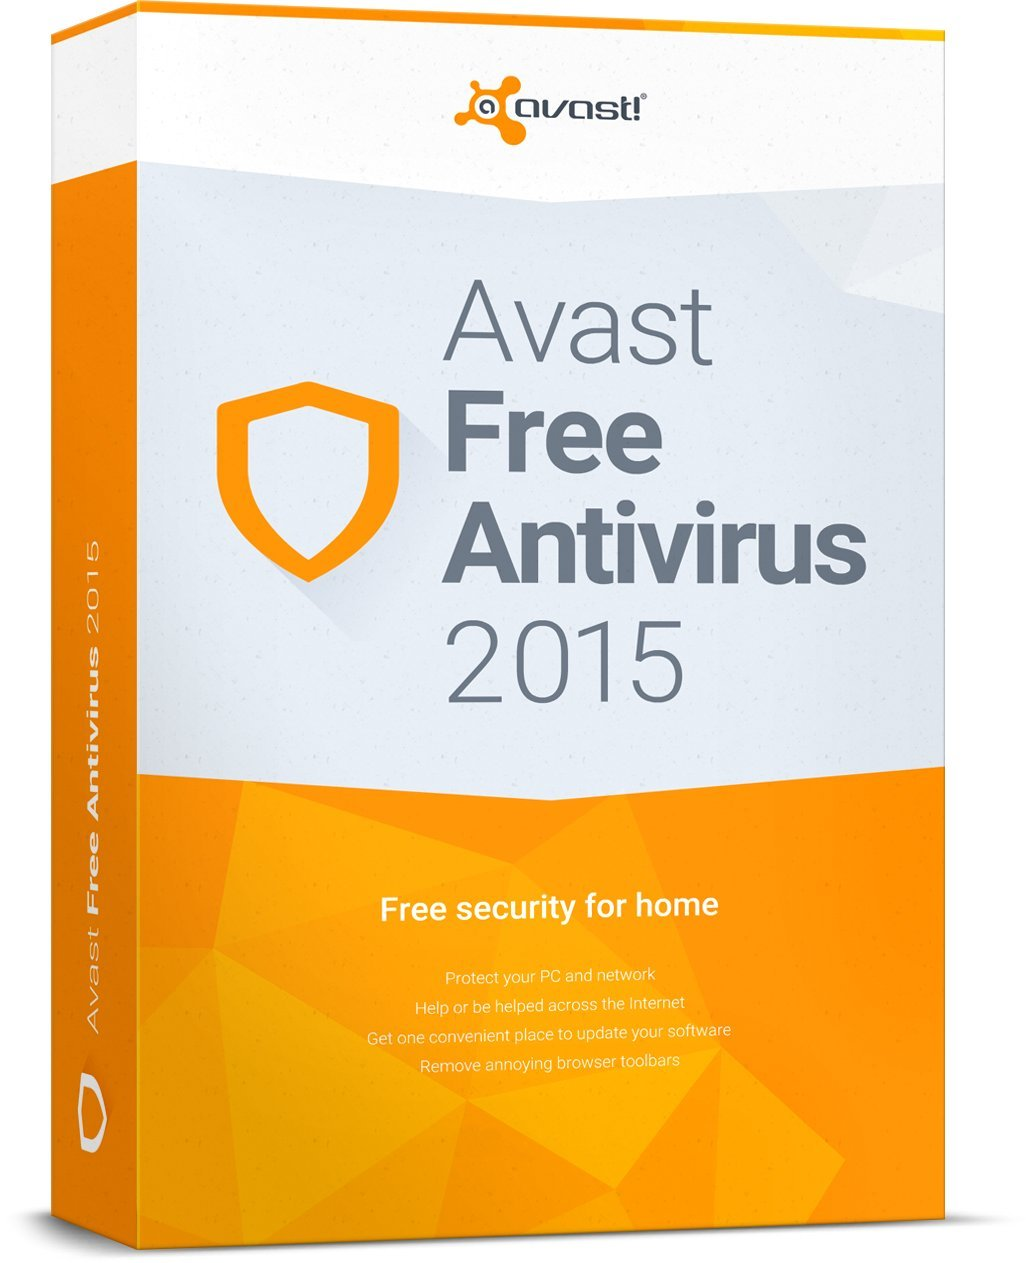 Avast Free Antivirus 2015 (Download)